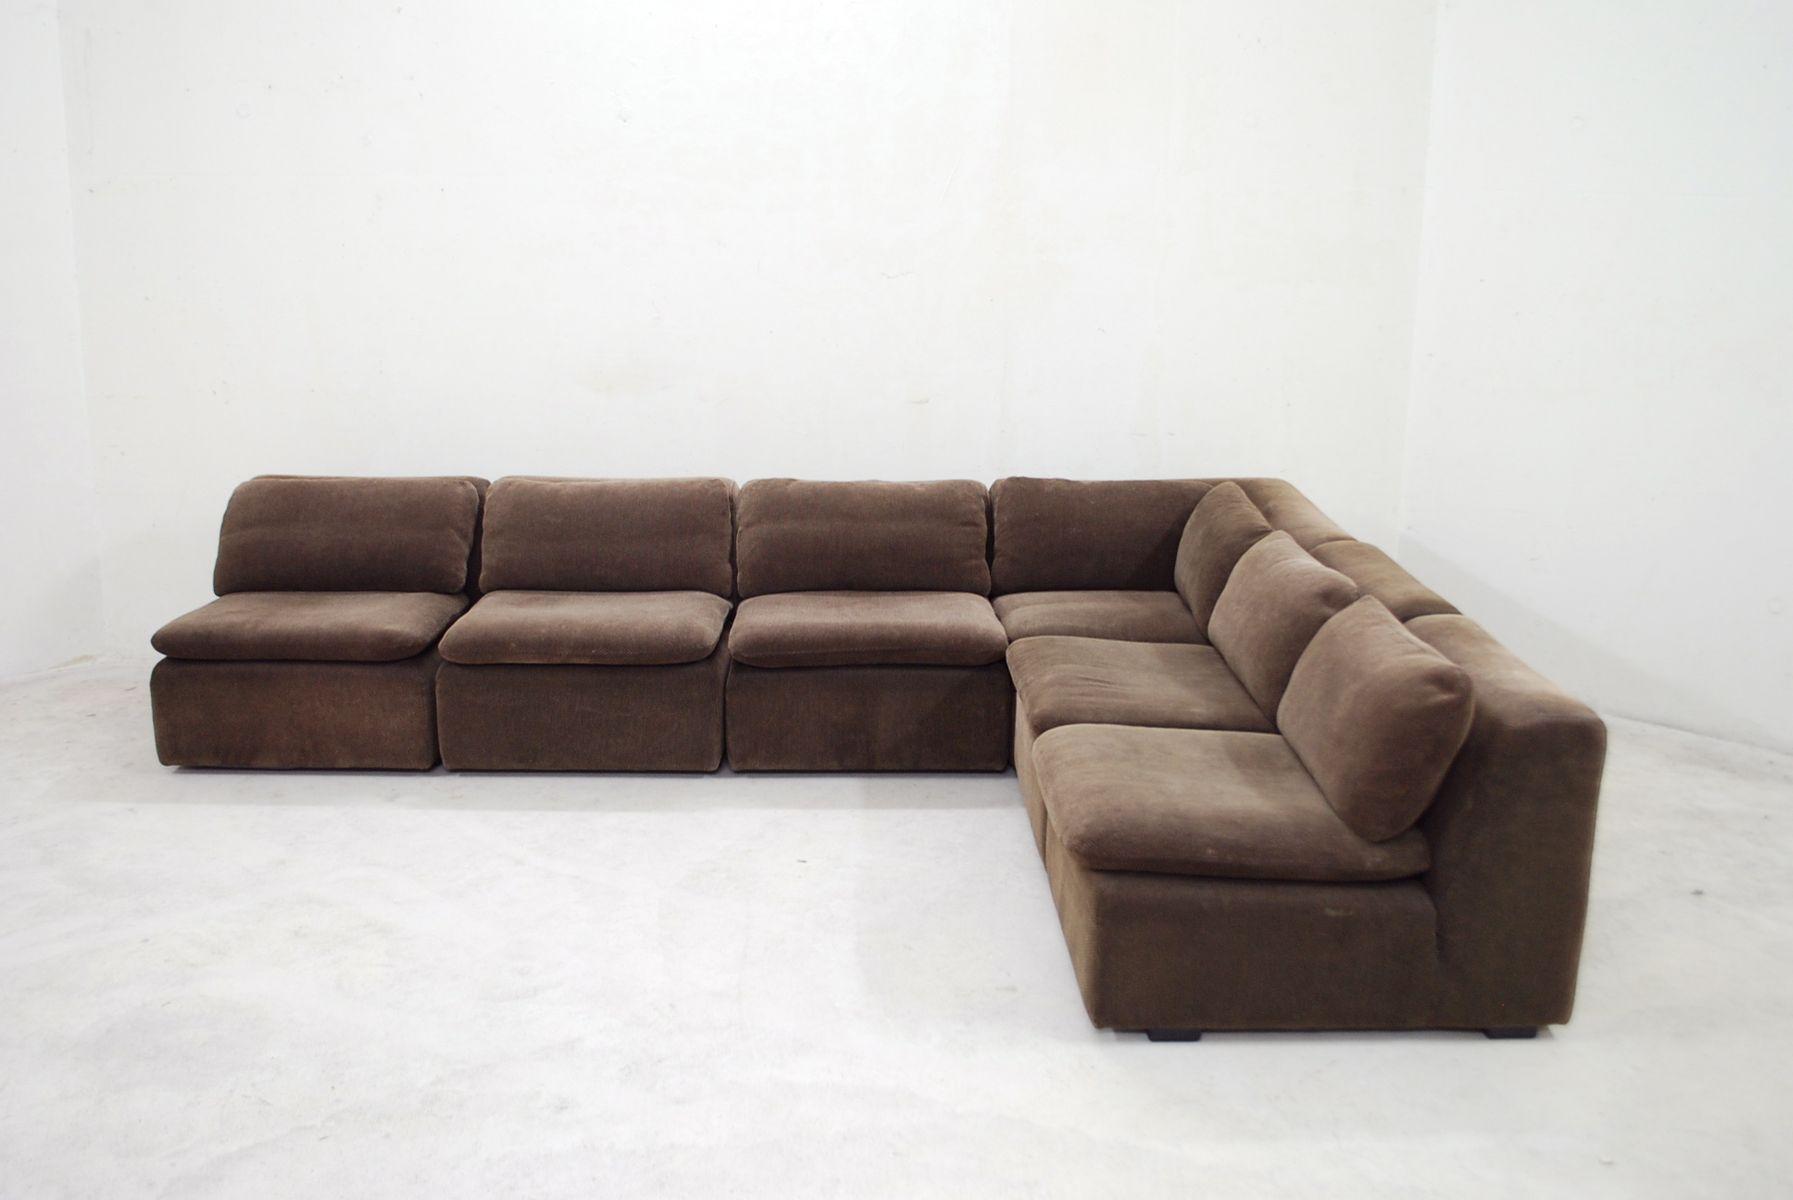 vintage brown modular sofa from cor bei pamono kaufen. Black Bedroom Furniture Sets. Home Design Ideas